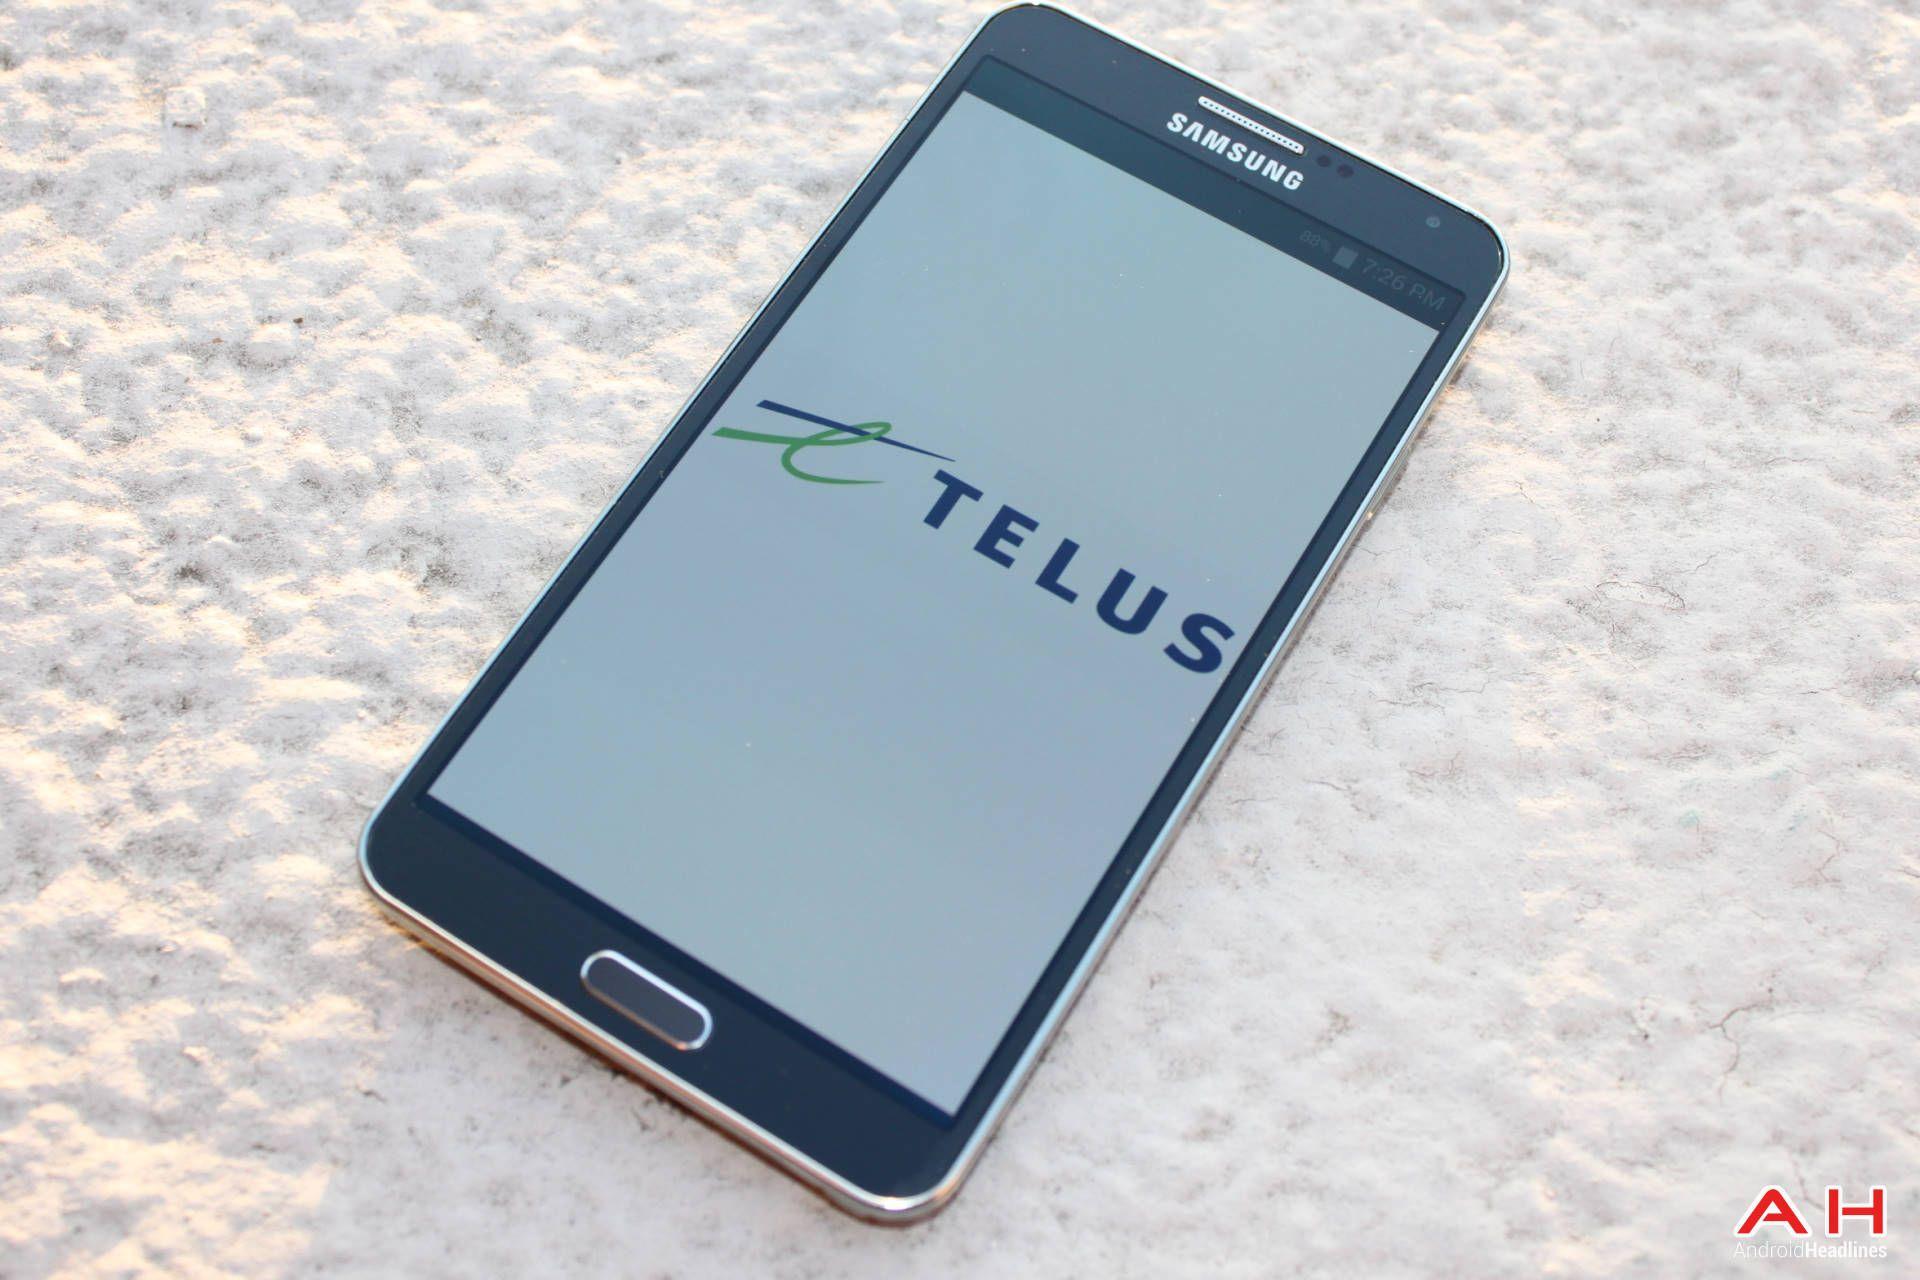 Marshmallow Delayed For Telus Galaxy S6 Edge, S6 Edge+